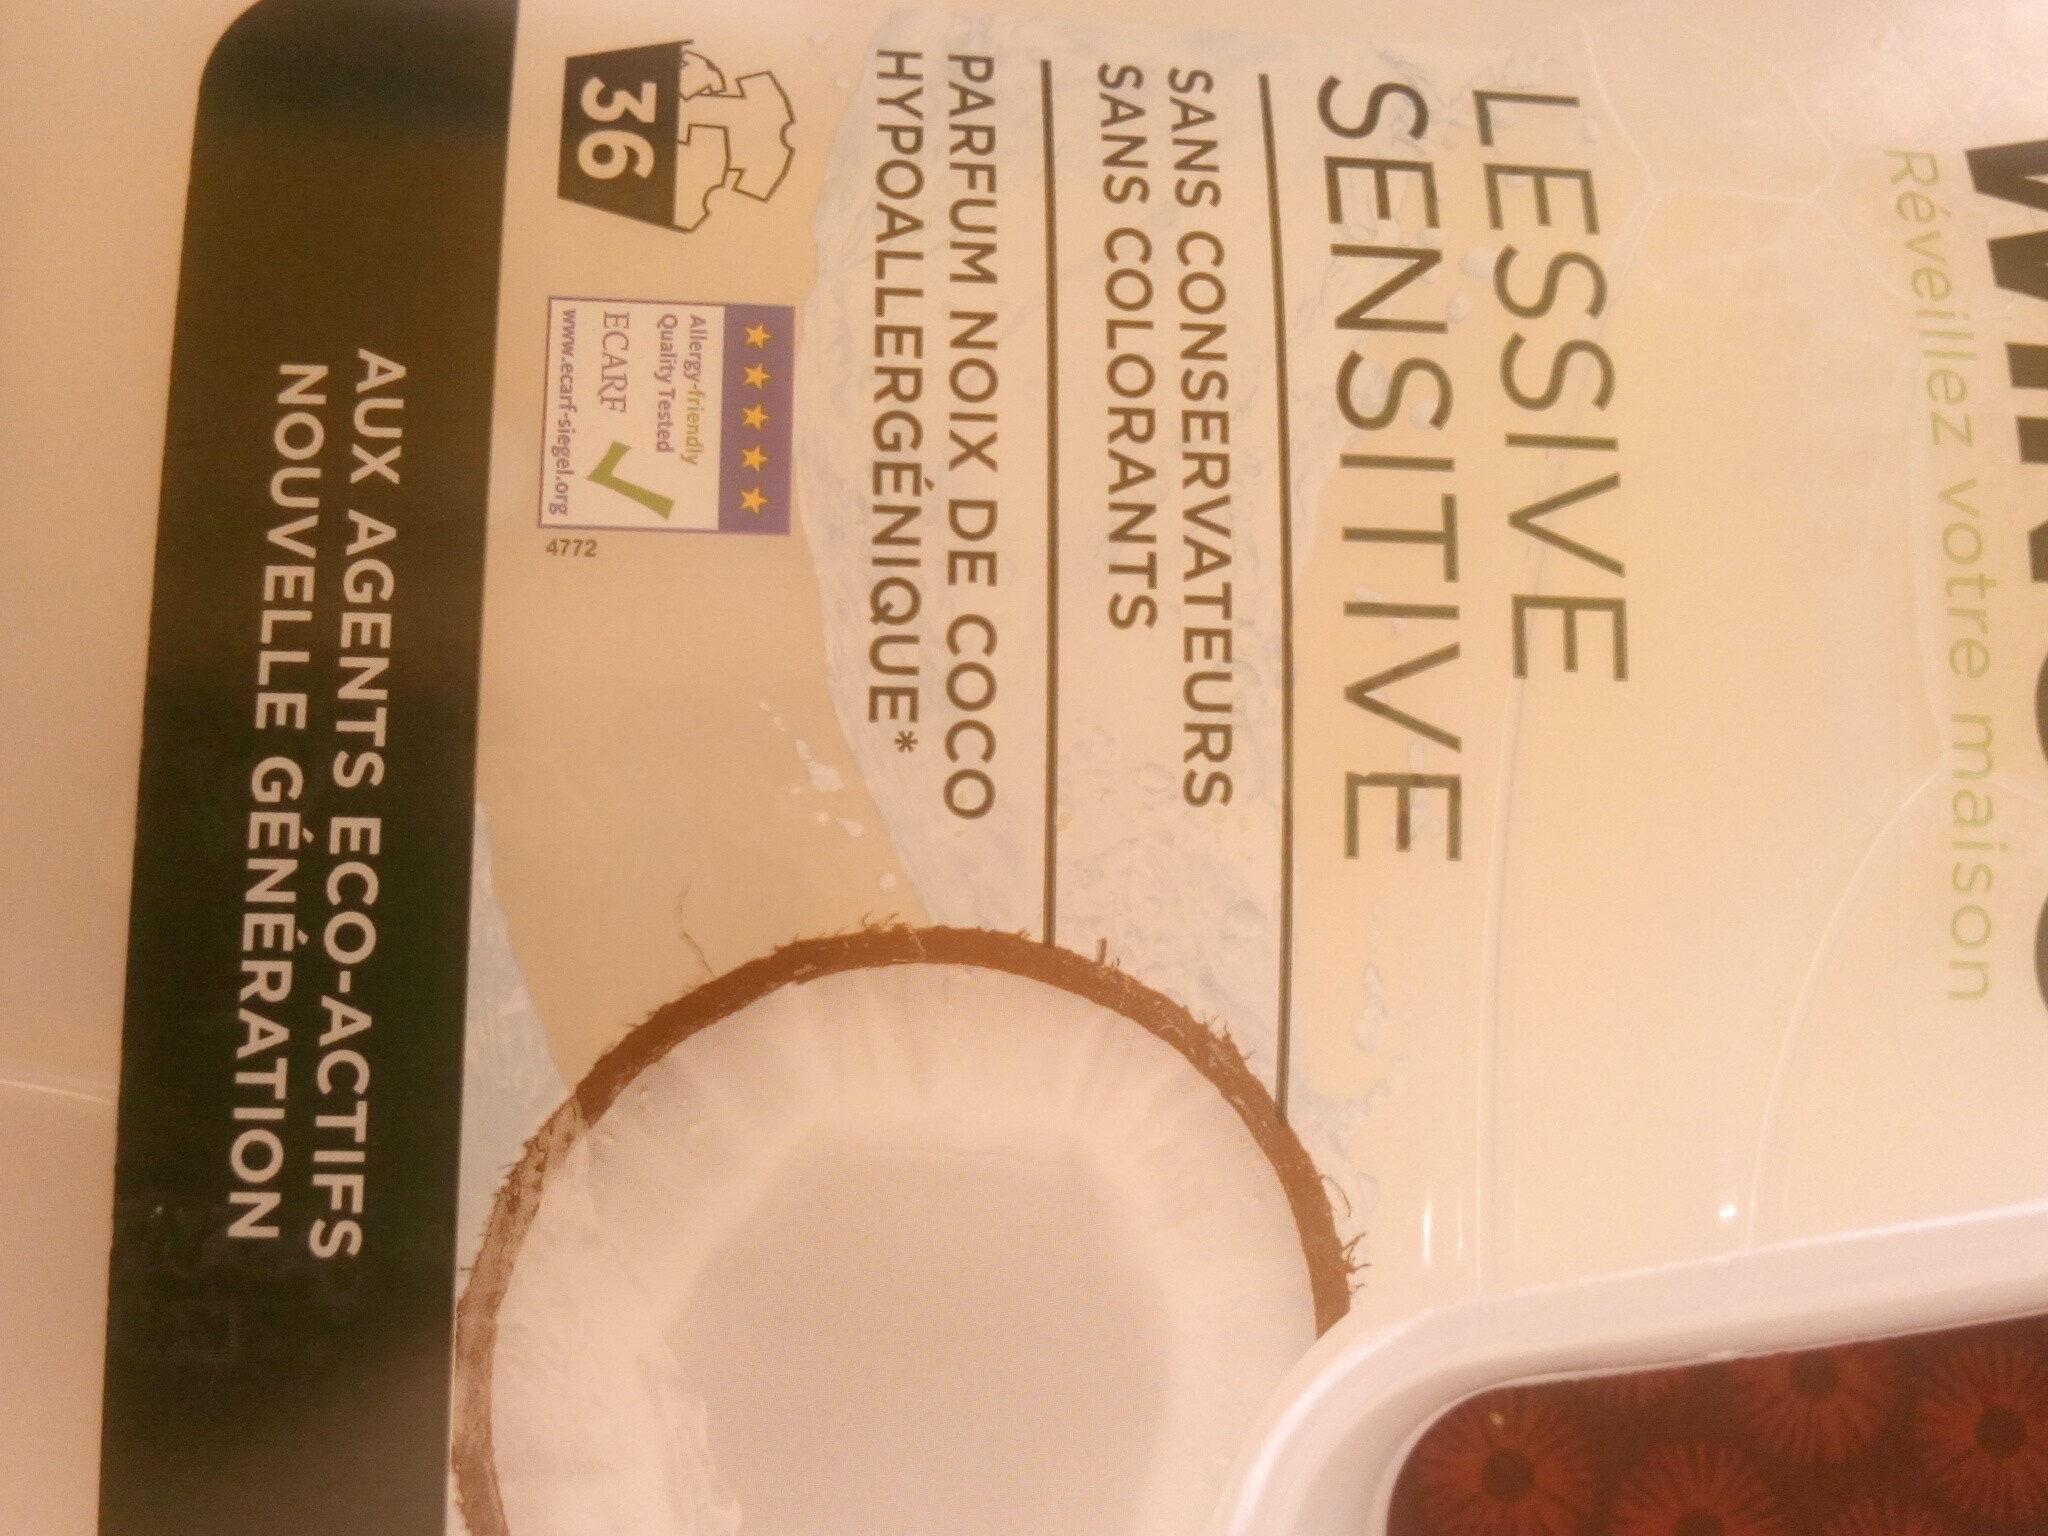 lessive sensitive - Product - fr